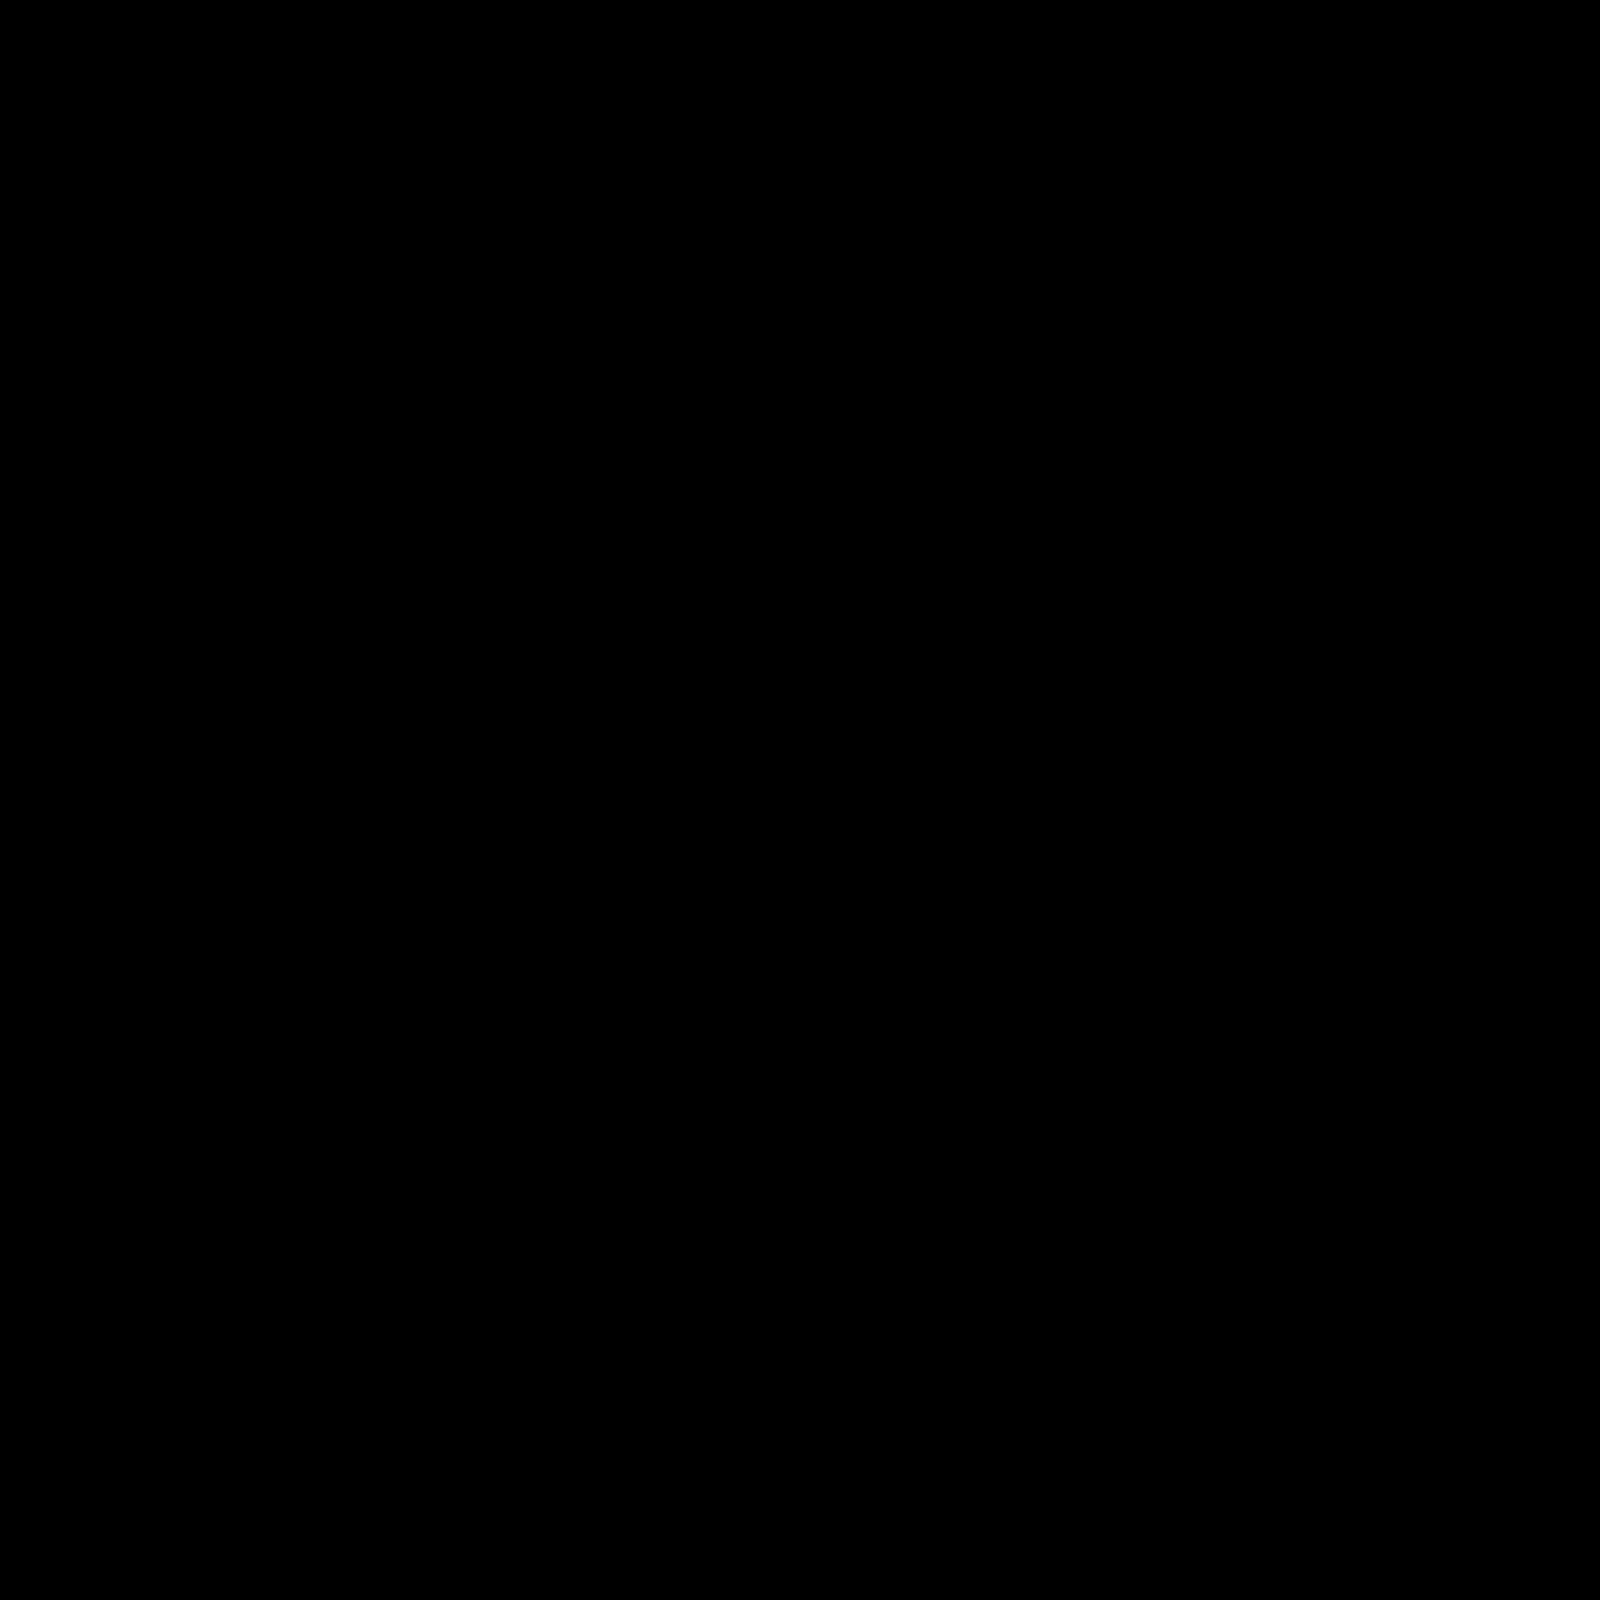 icone comp u00e9tence cv